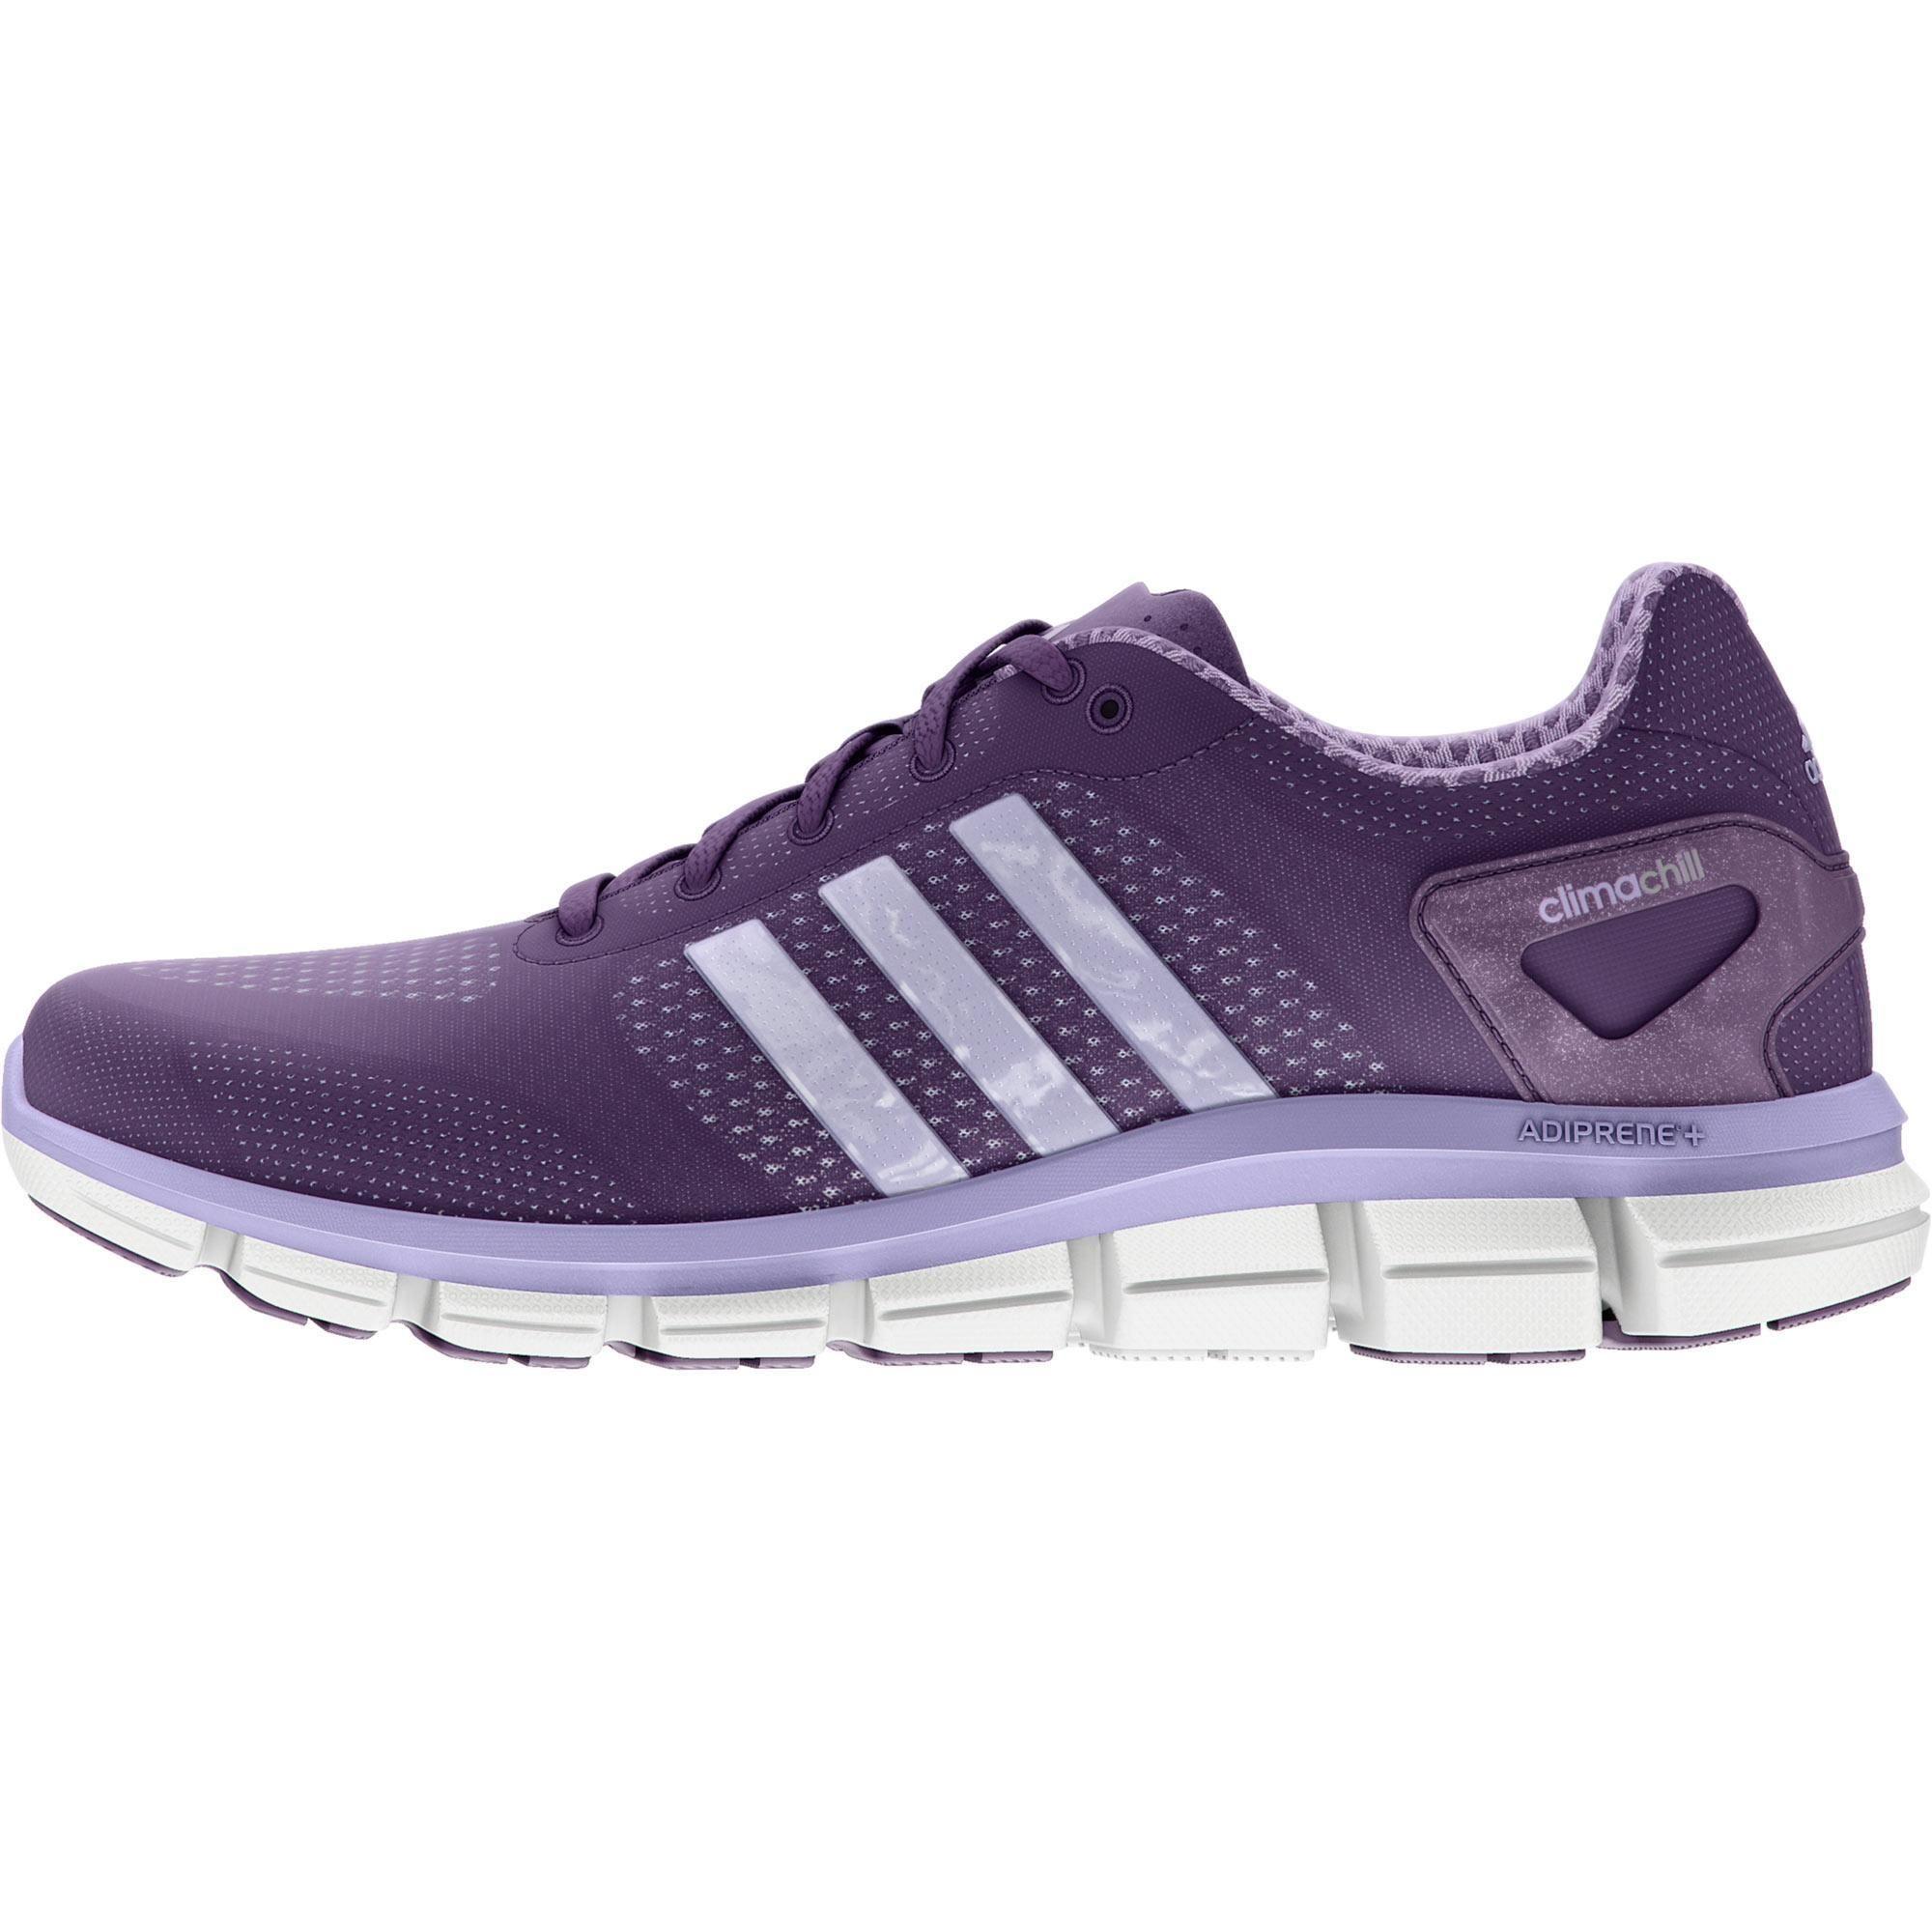 liderazgo Positivo Expulsar a  Adidas Womens ClimaCool Ride Running Shoes - Tribe Purple ... adidas  climacool womens shoes purple running ride … | Adidas shoes, Adidas, Adidas  climacool shoes